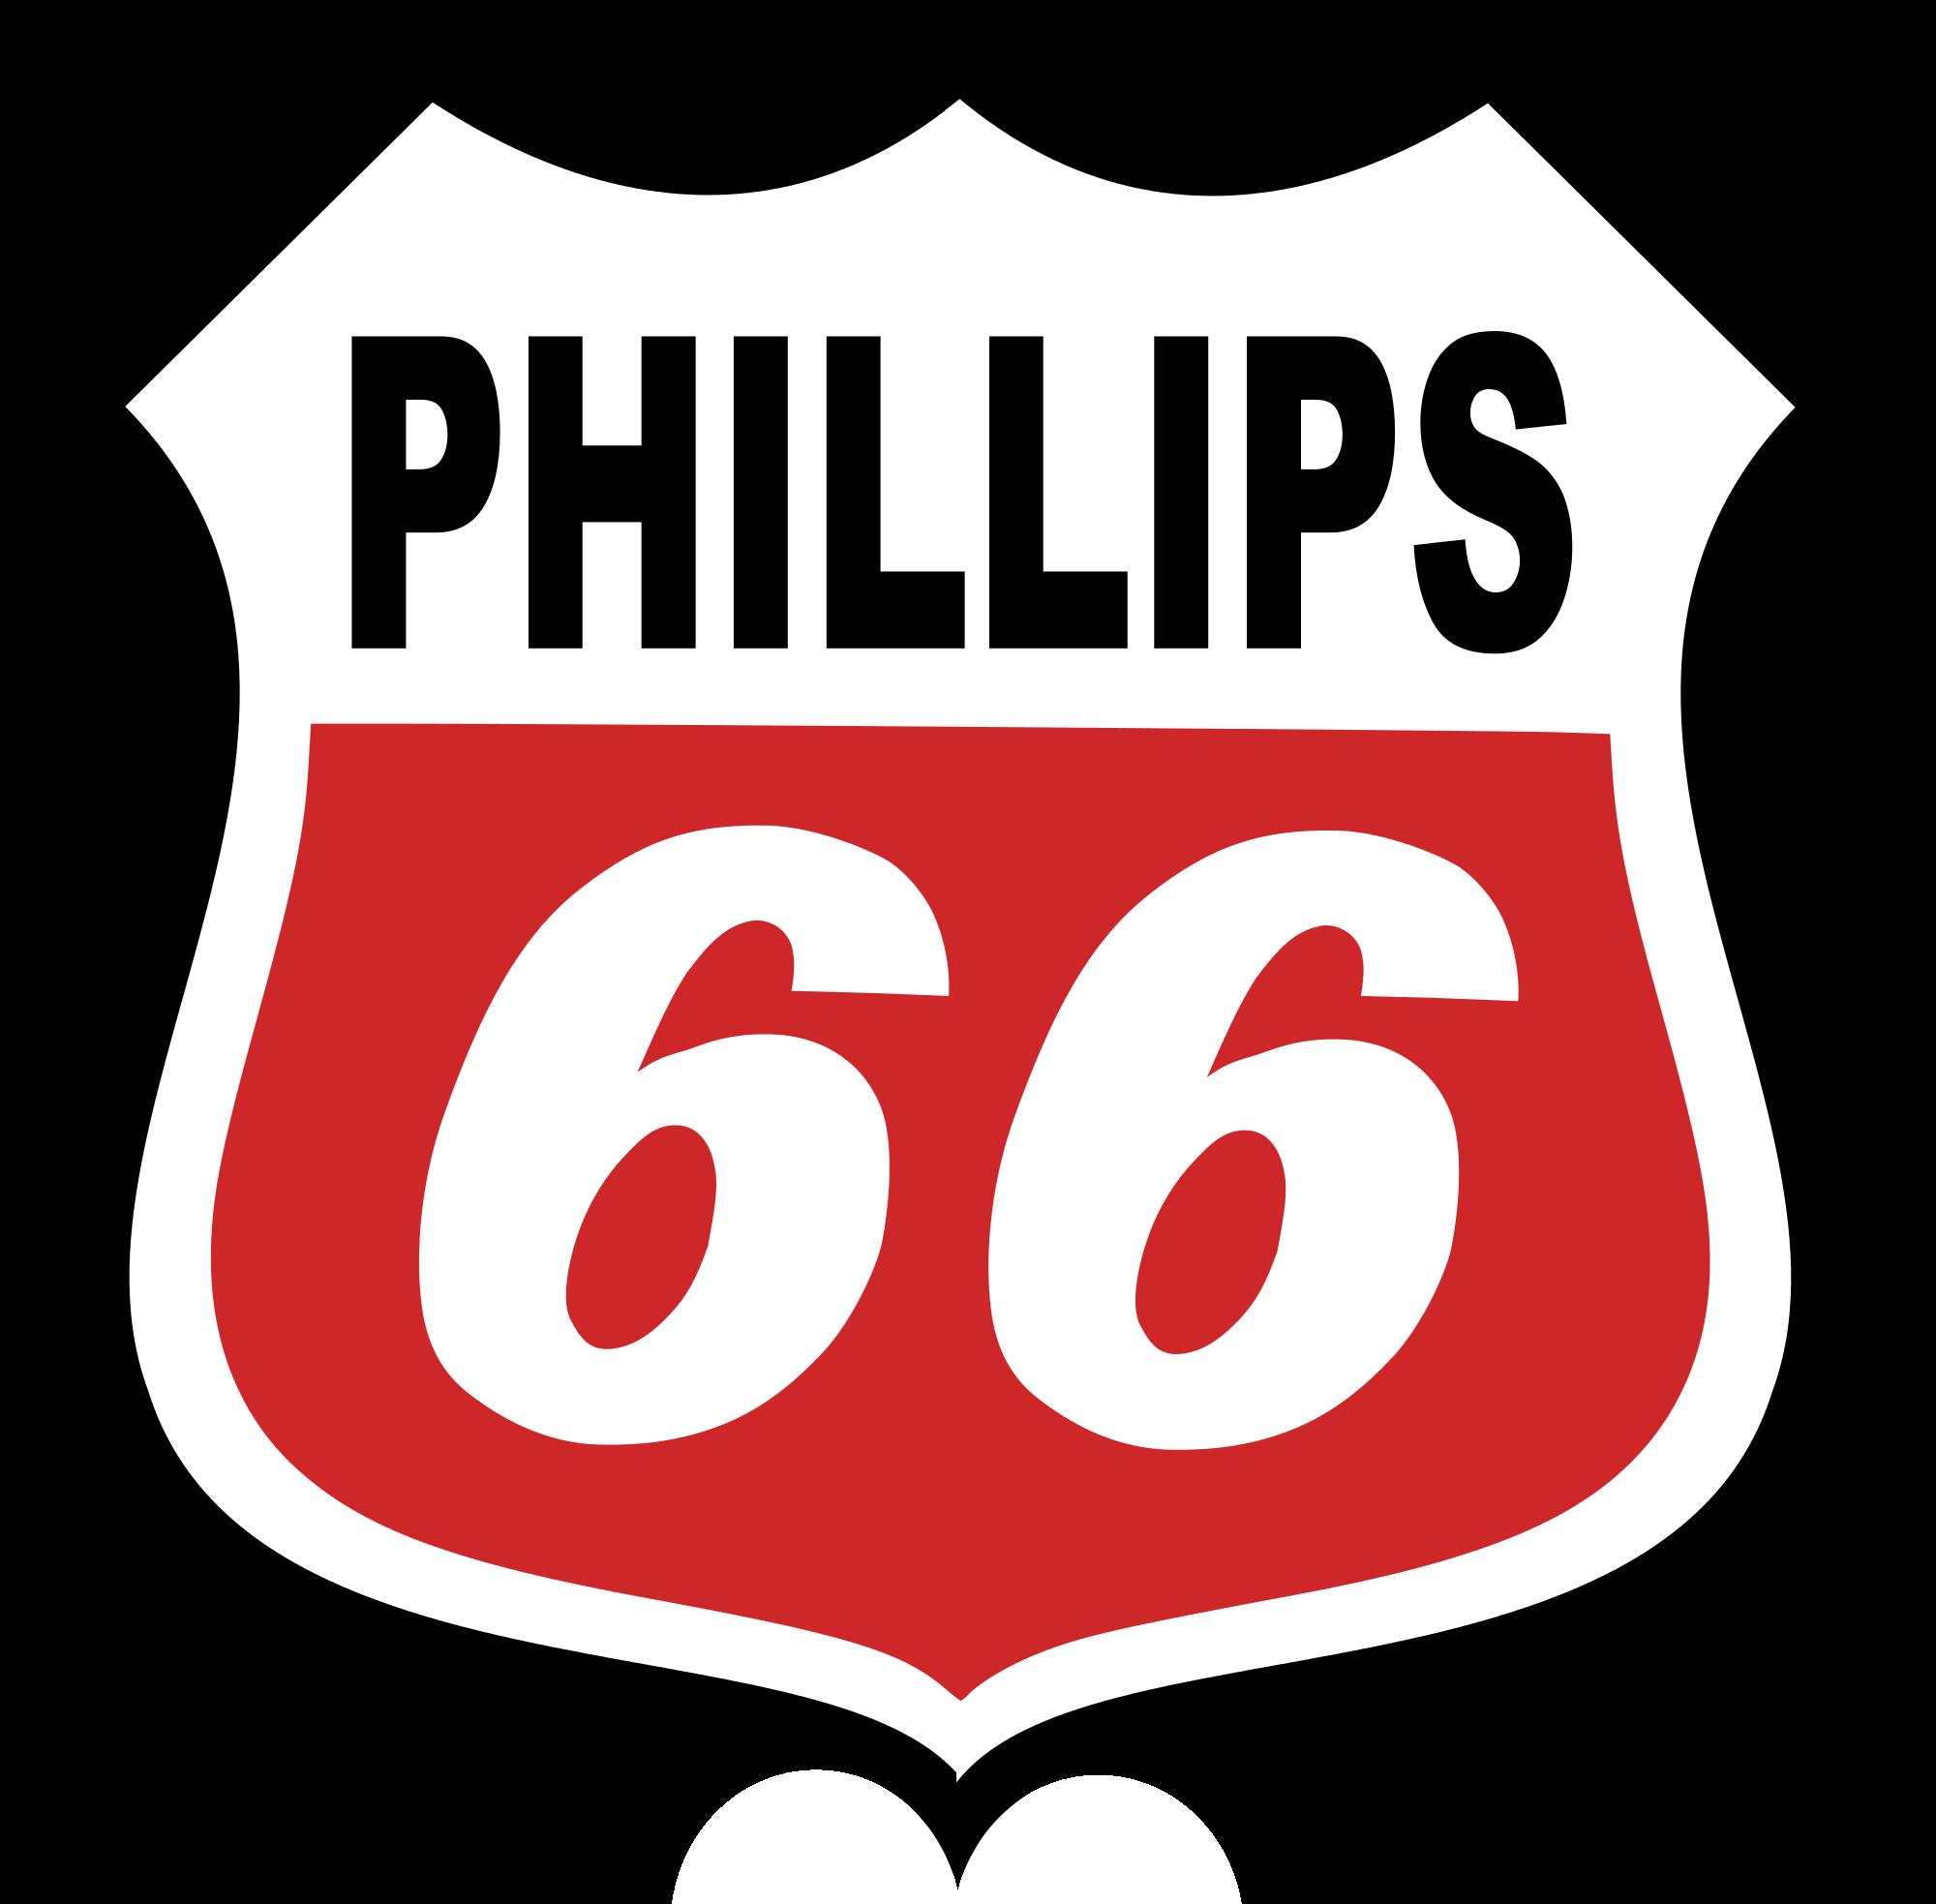 Phillips 66 Magnus Oil 220 Cross Reference